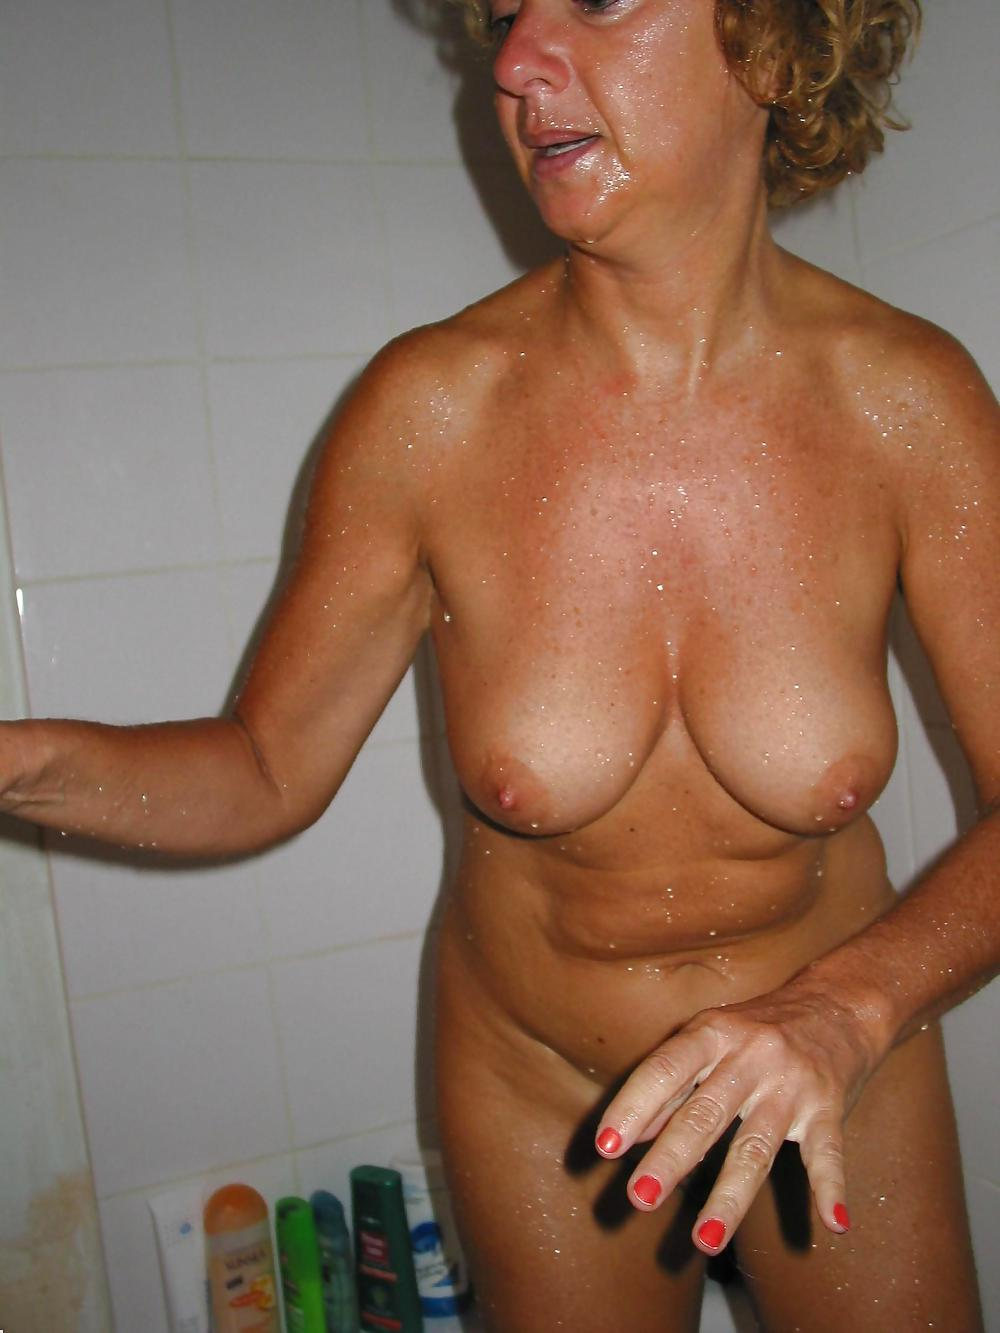 http://hotamateurmature.com/gallery/Housewives_milf_mature_elders/98.jpg